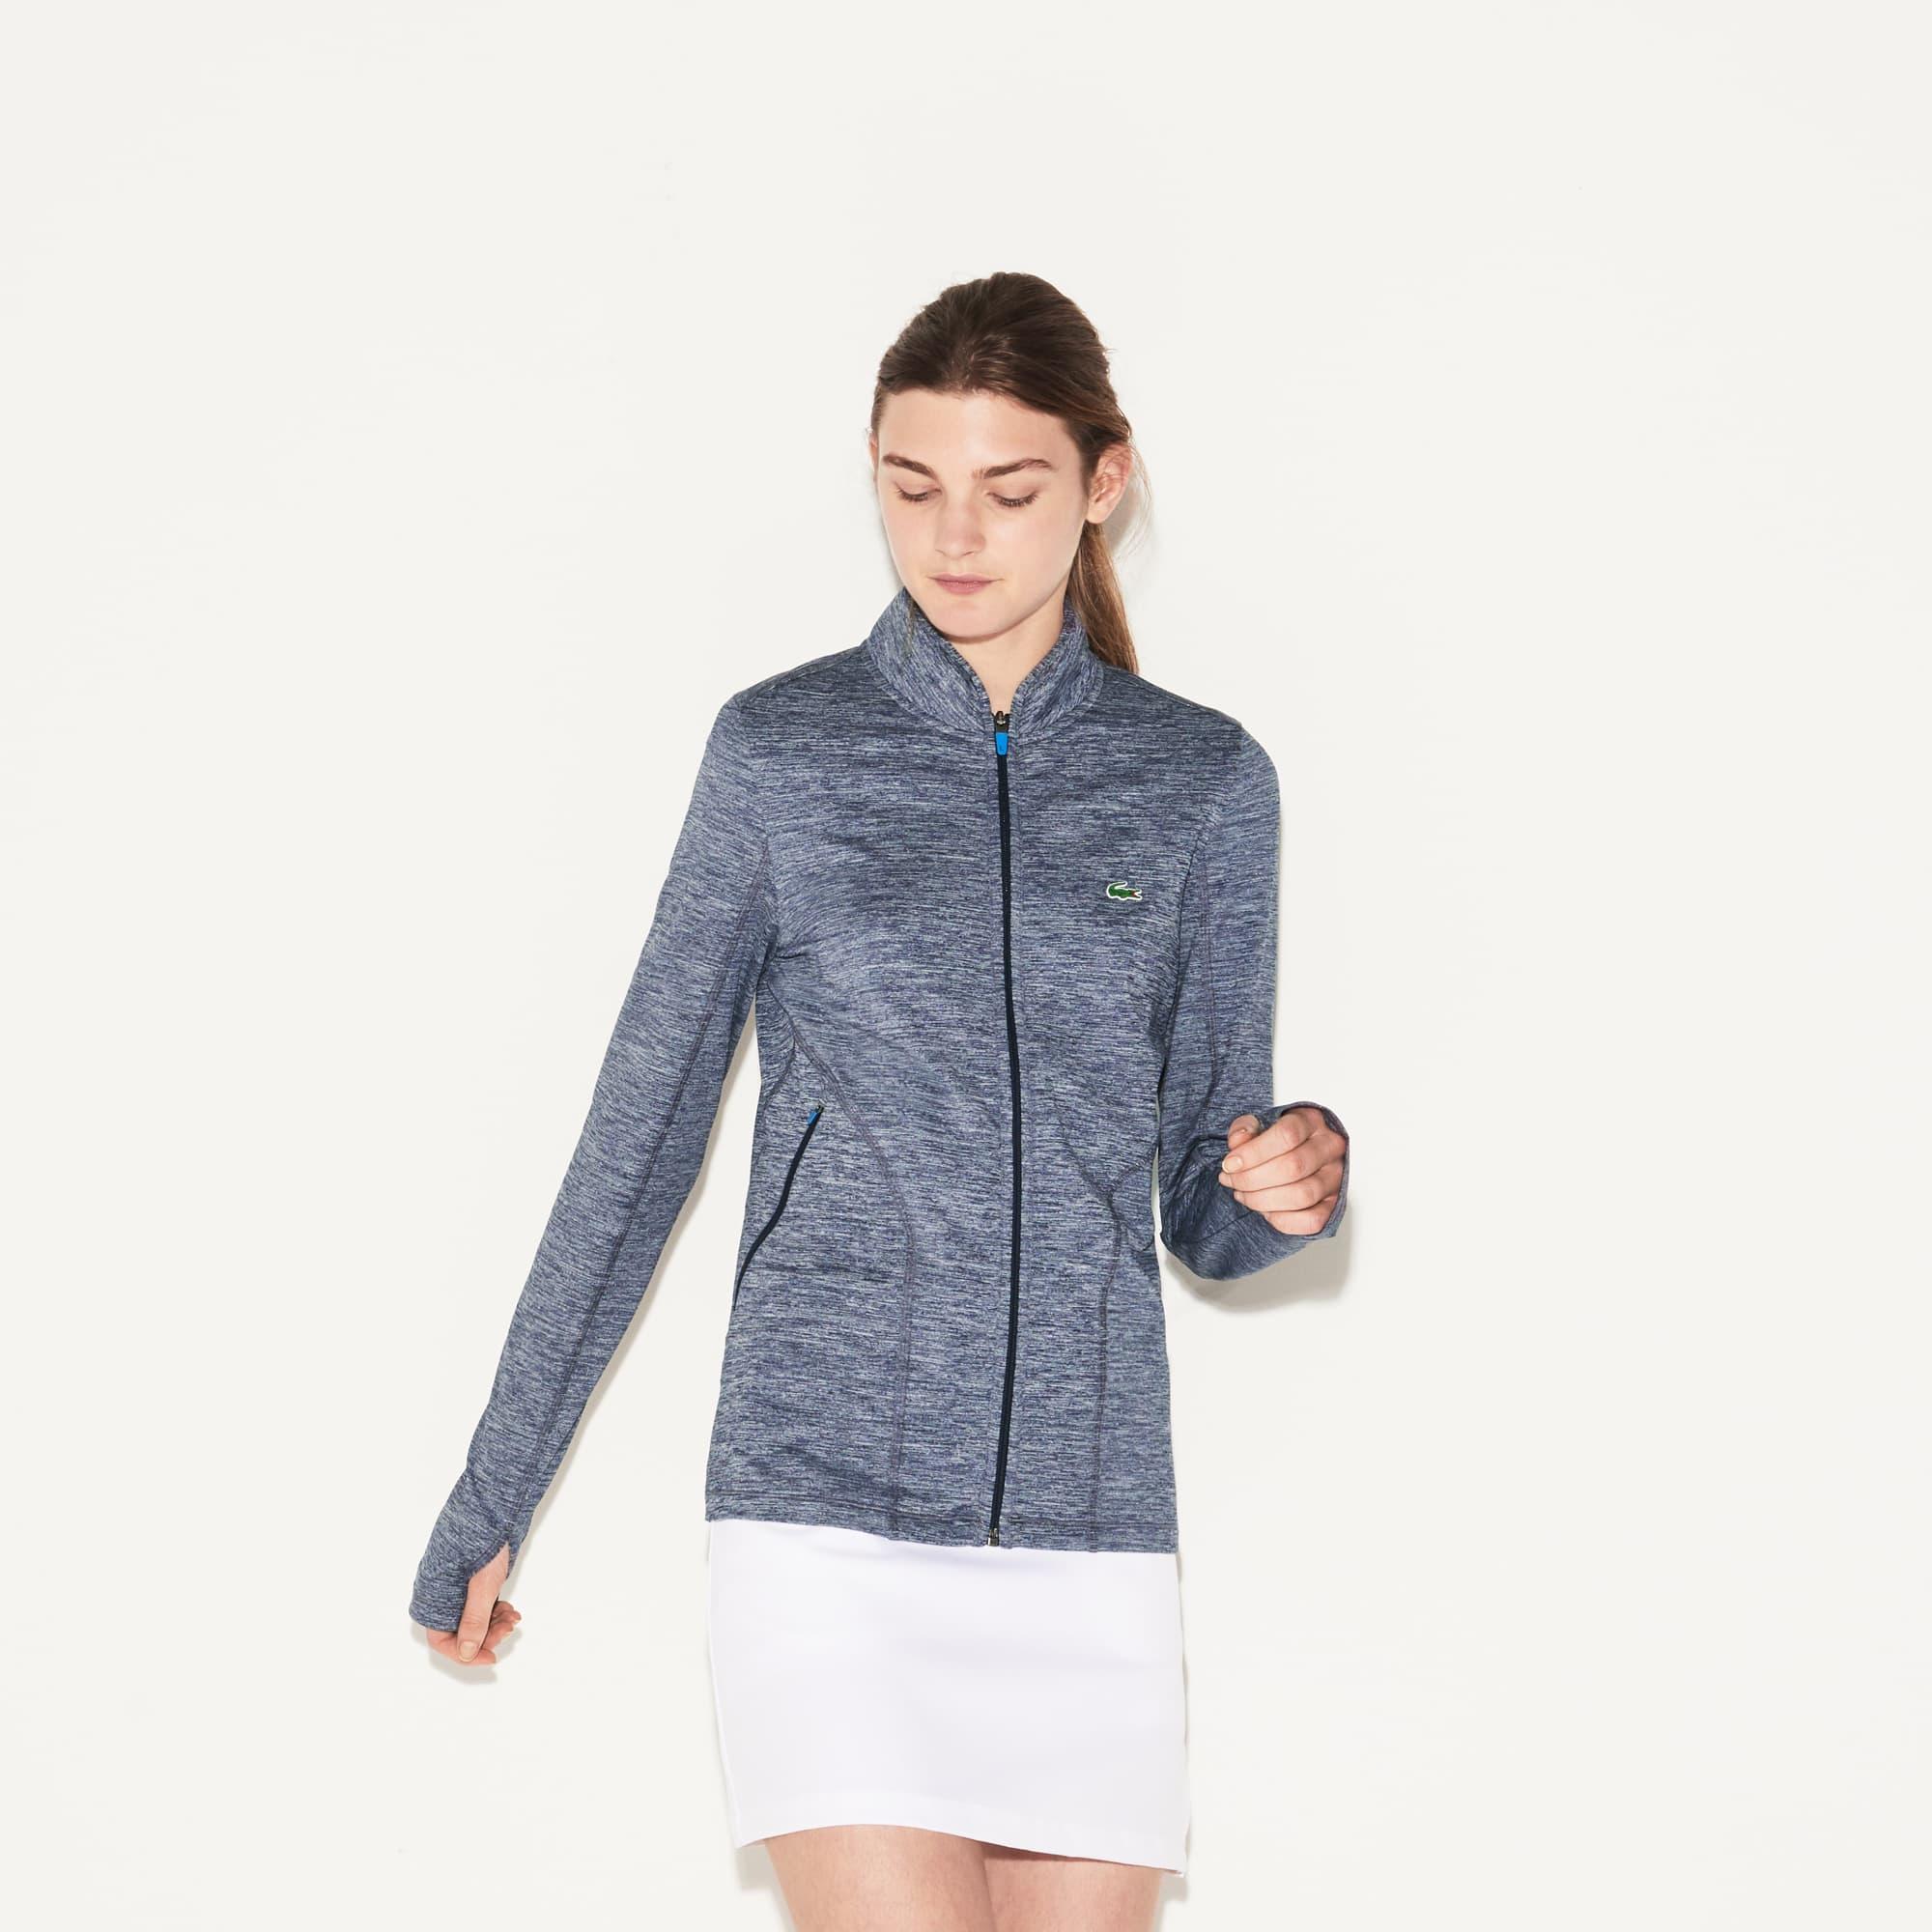 Women's Lacoste SPORT Golf Stretch Tech Midlayer Zip Sweatshirt